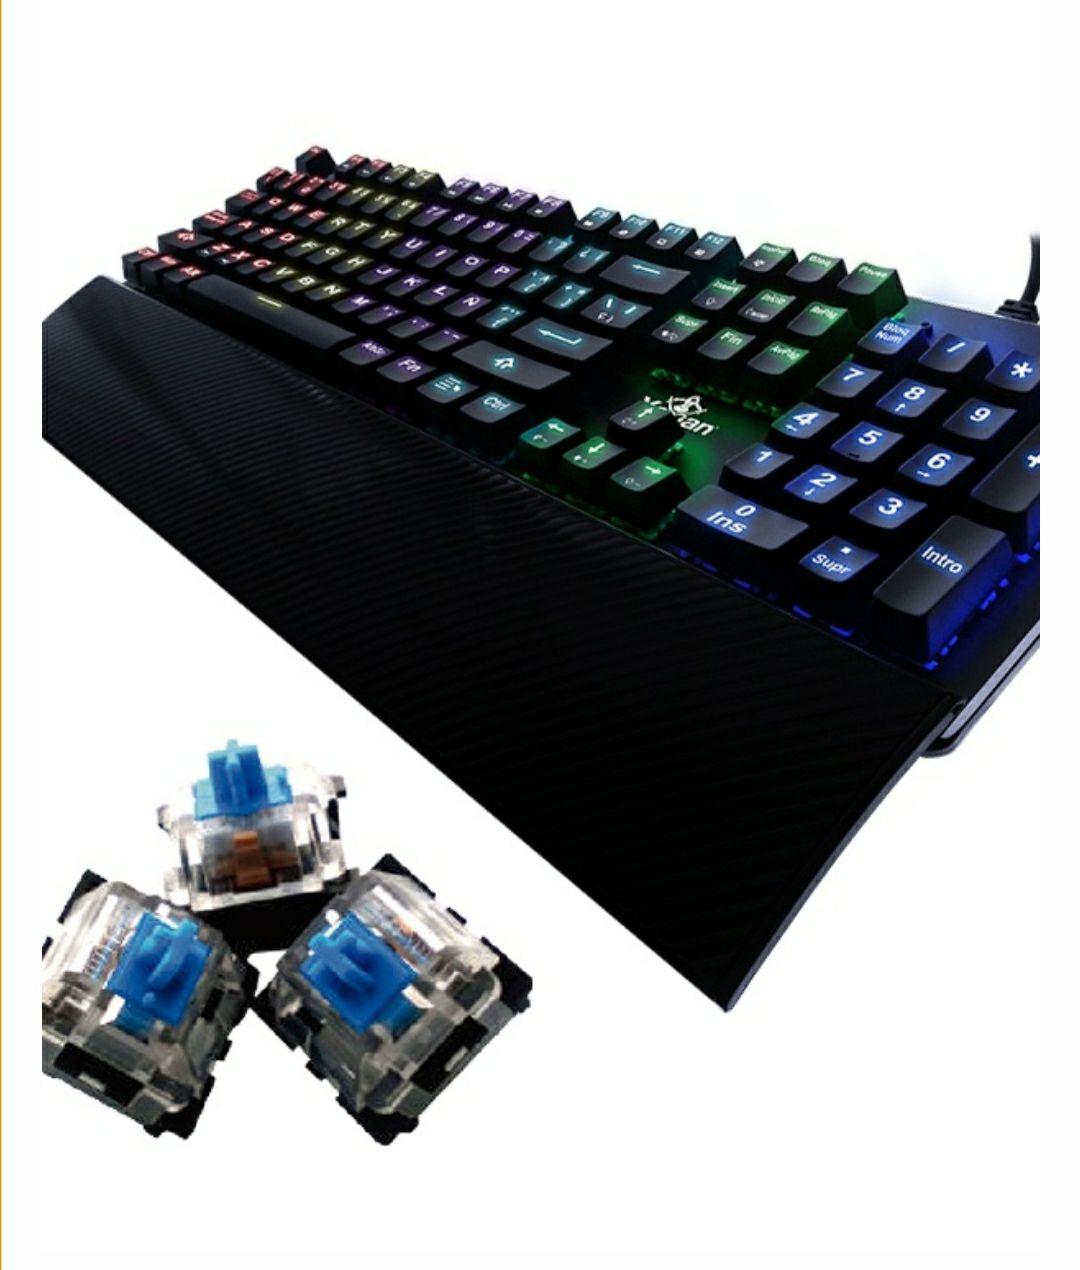 CyberPuerta: Teclado Gamer Yeyian Flare Serie 2000 RGB, Teclado Mecánico, Outemu Blue, Alámbrico, Negro (Español)